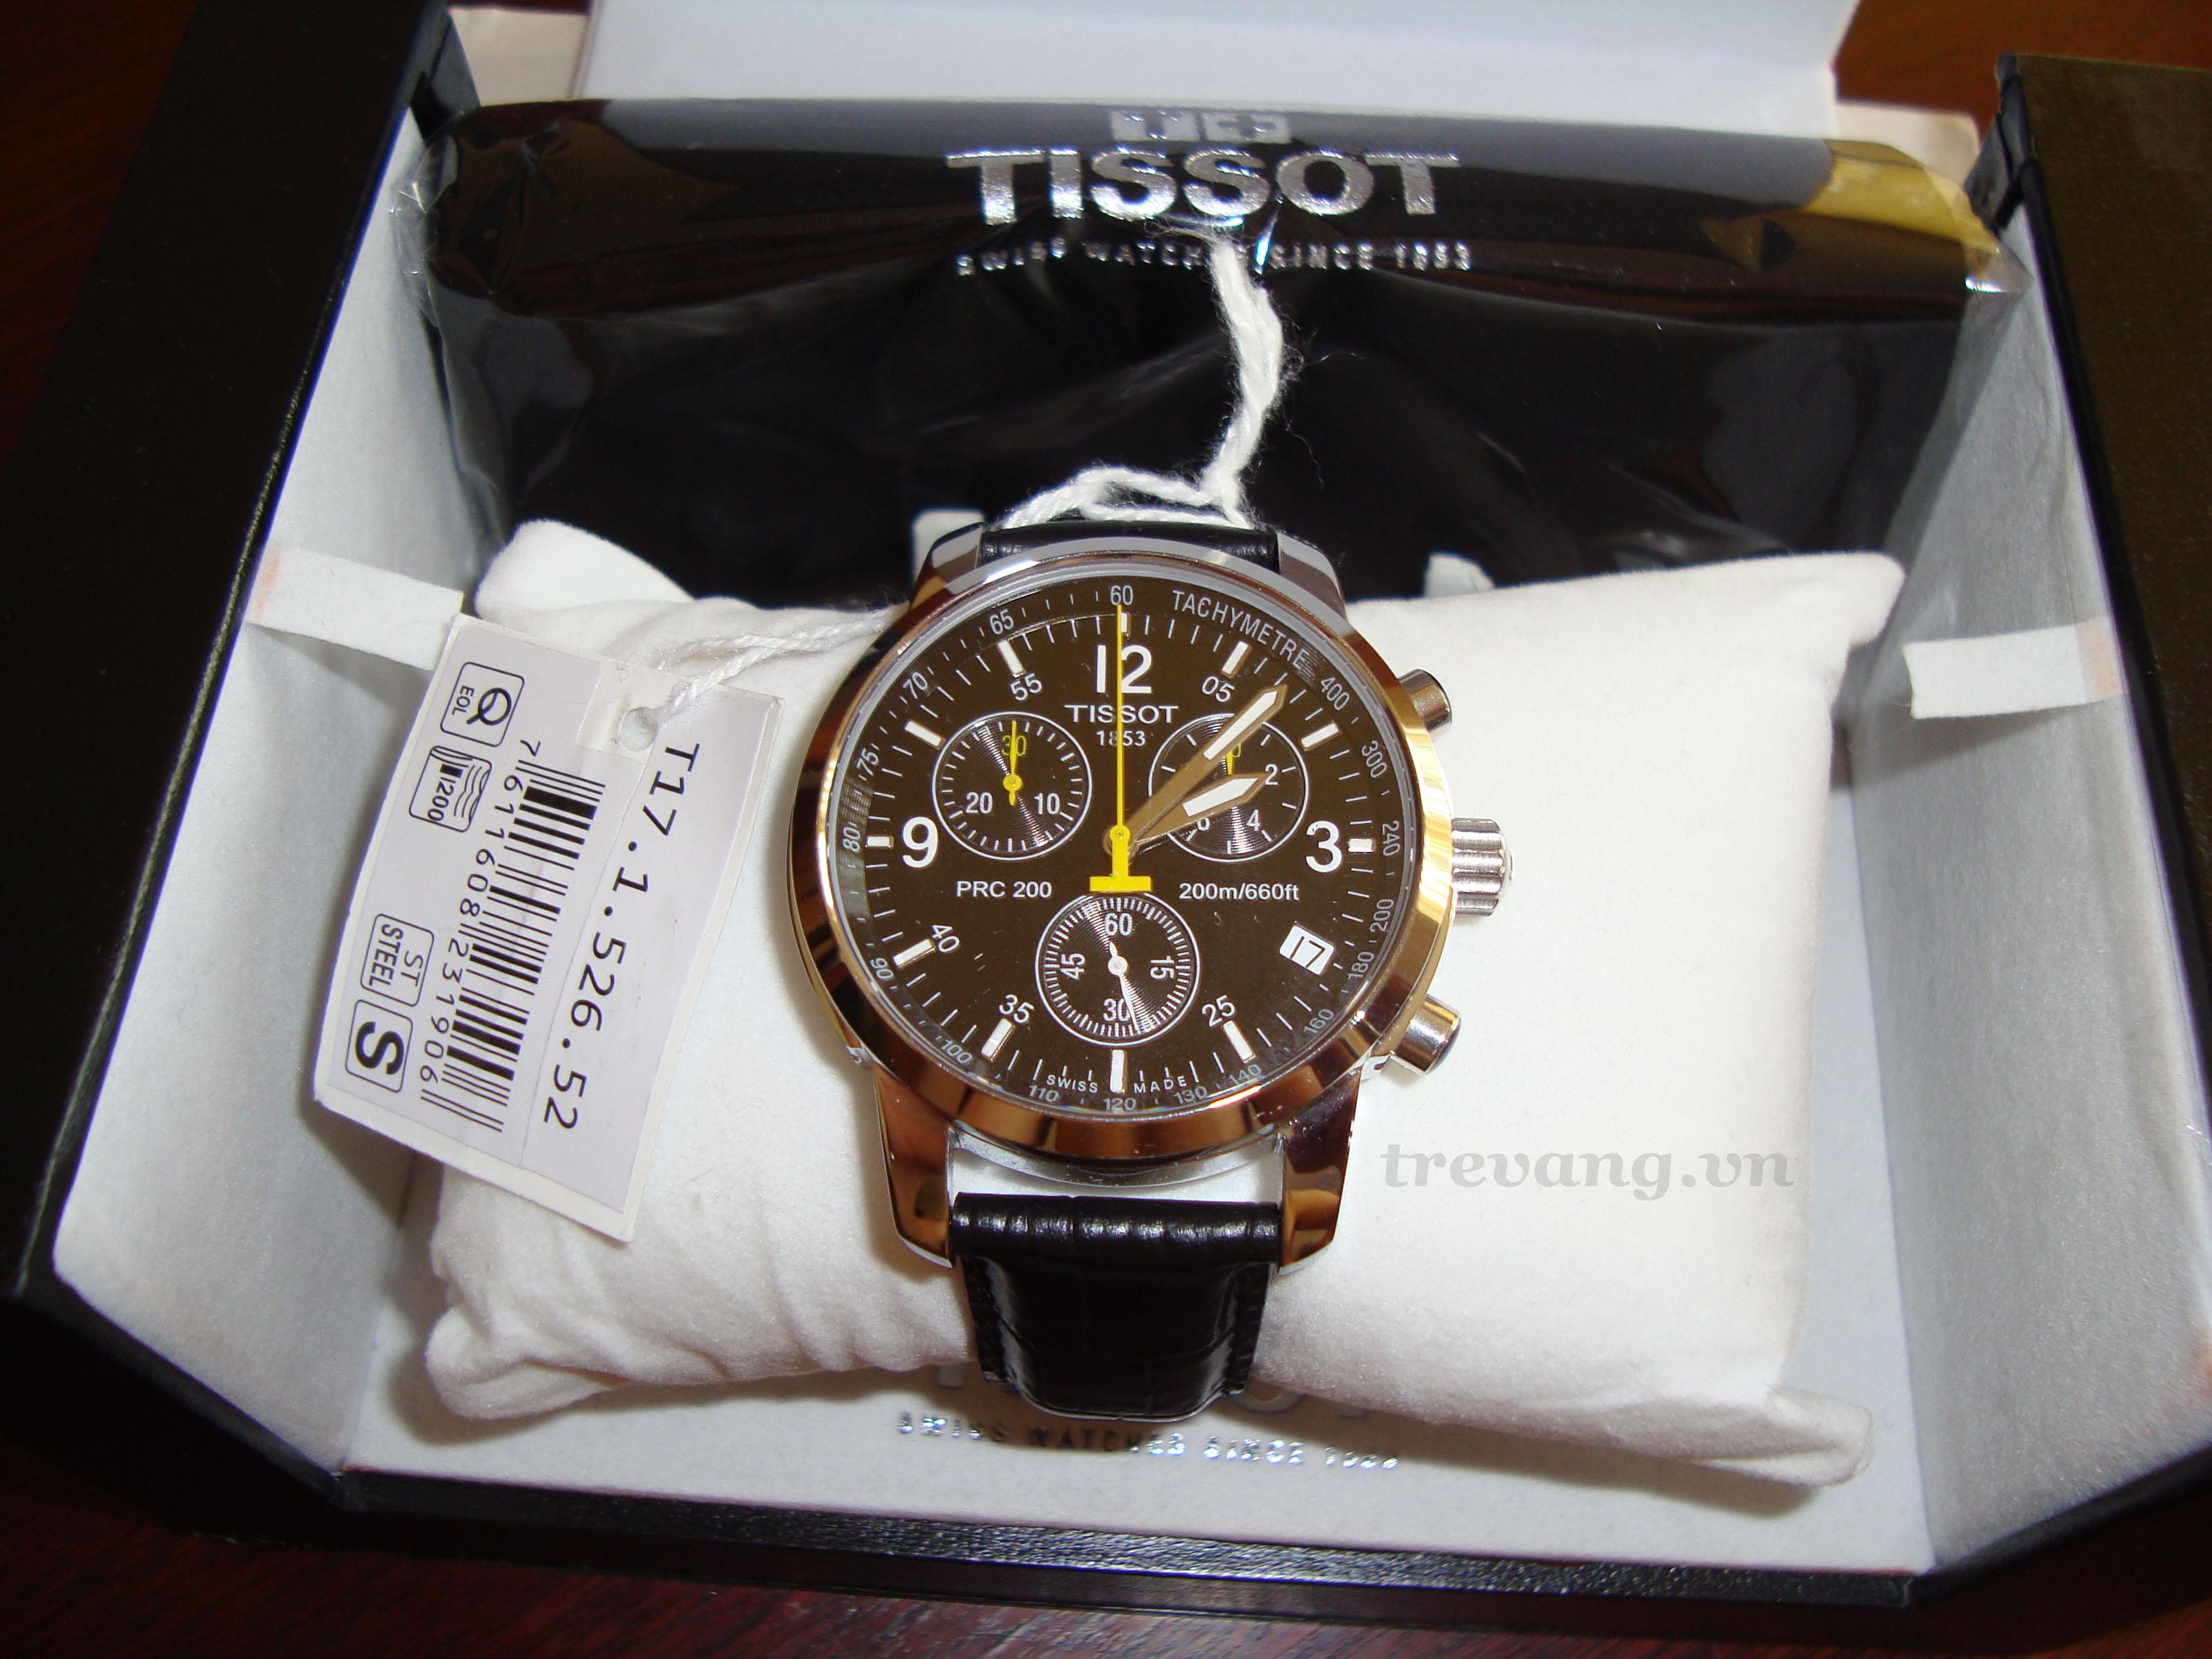 Đồng hồ Tissot T17.1.526.52 dây da cao cấp.